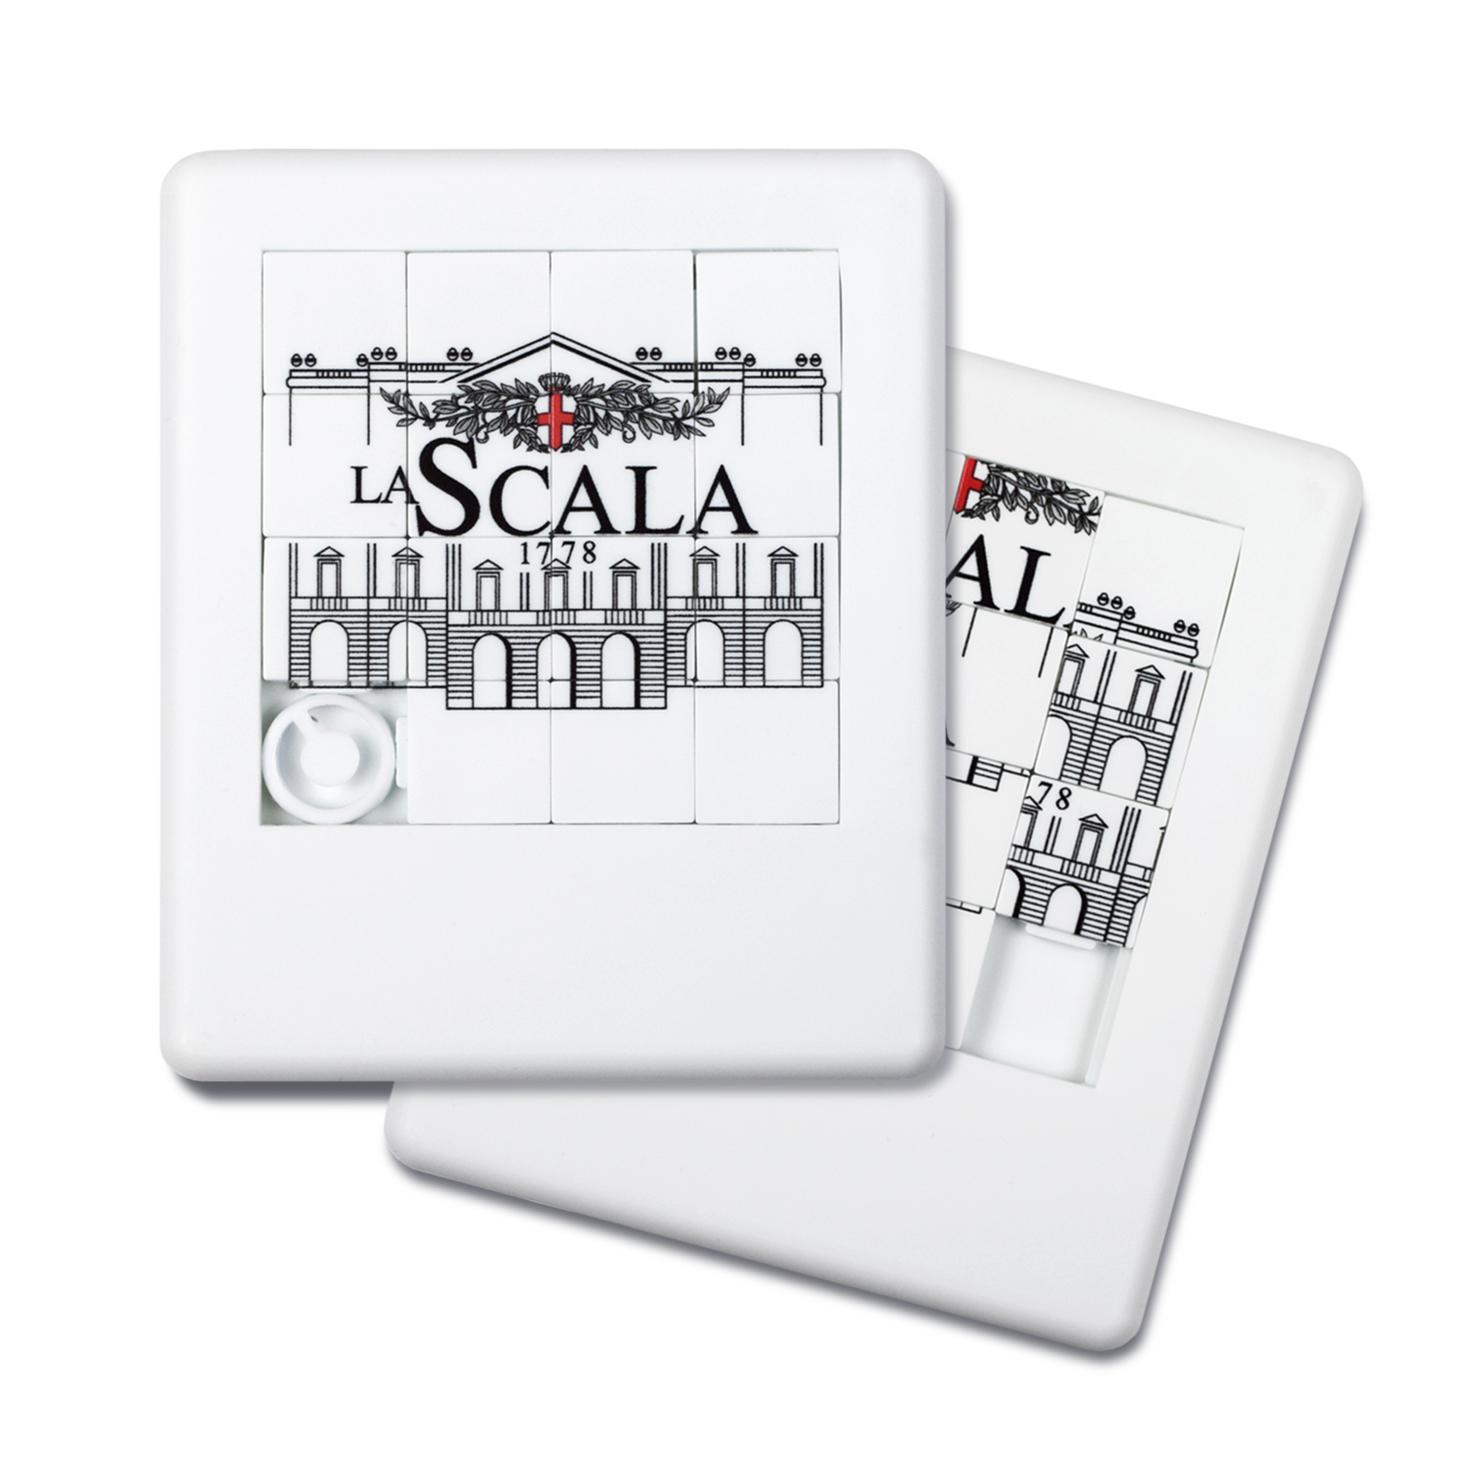 Gioco del 15 con logo teatro la Scala